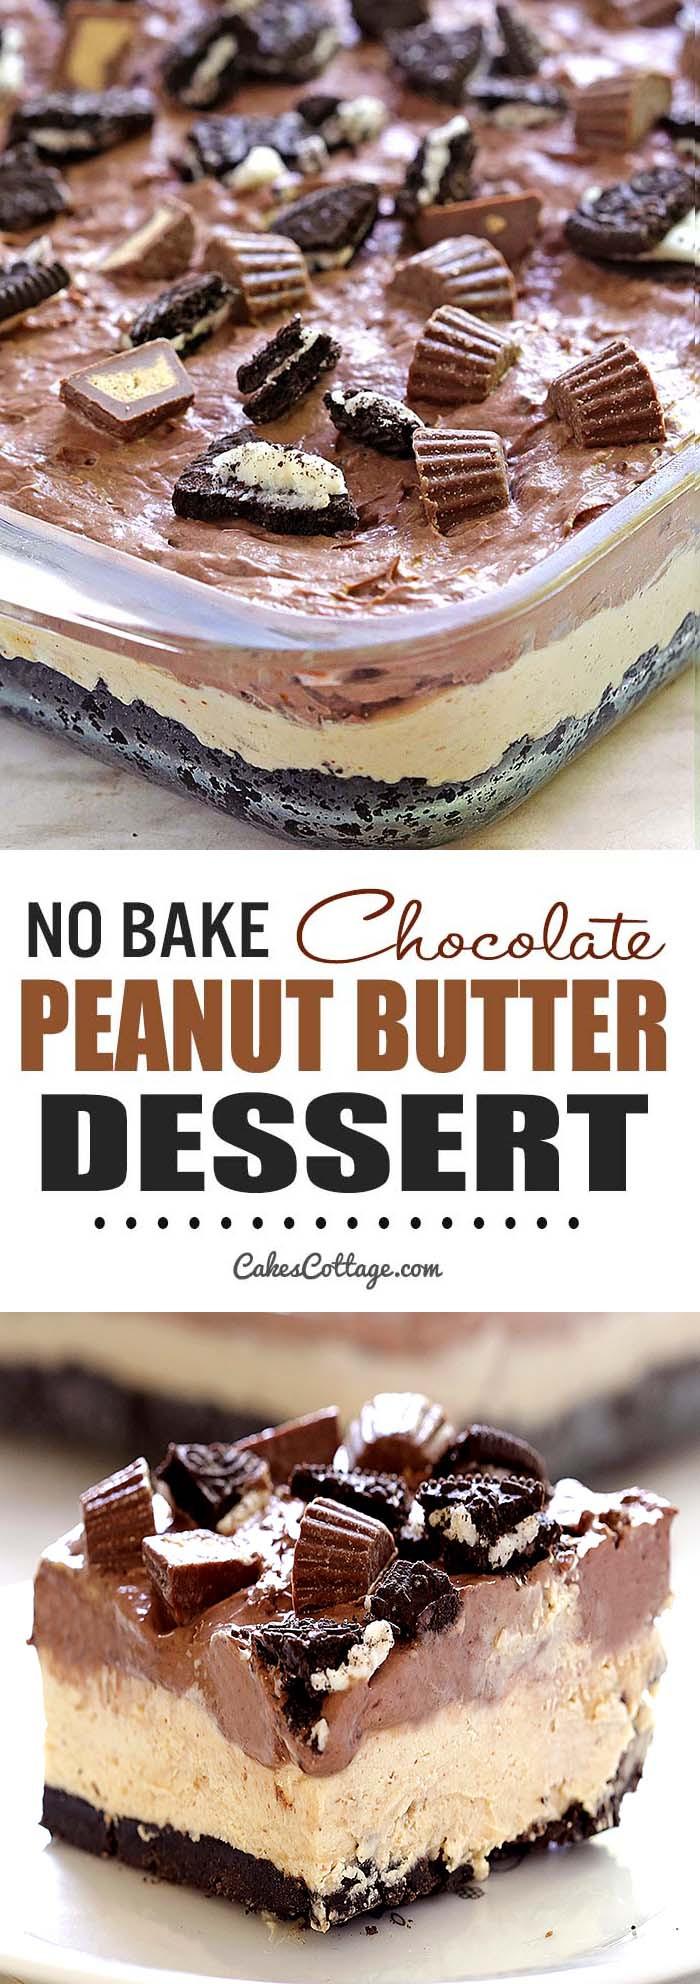 Chocolate Desserts Easy  No Bake Chocolate Peanut Butter Dessert Cakescottage